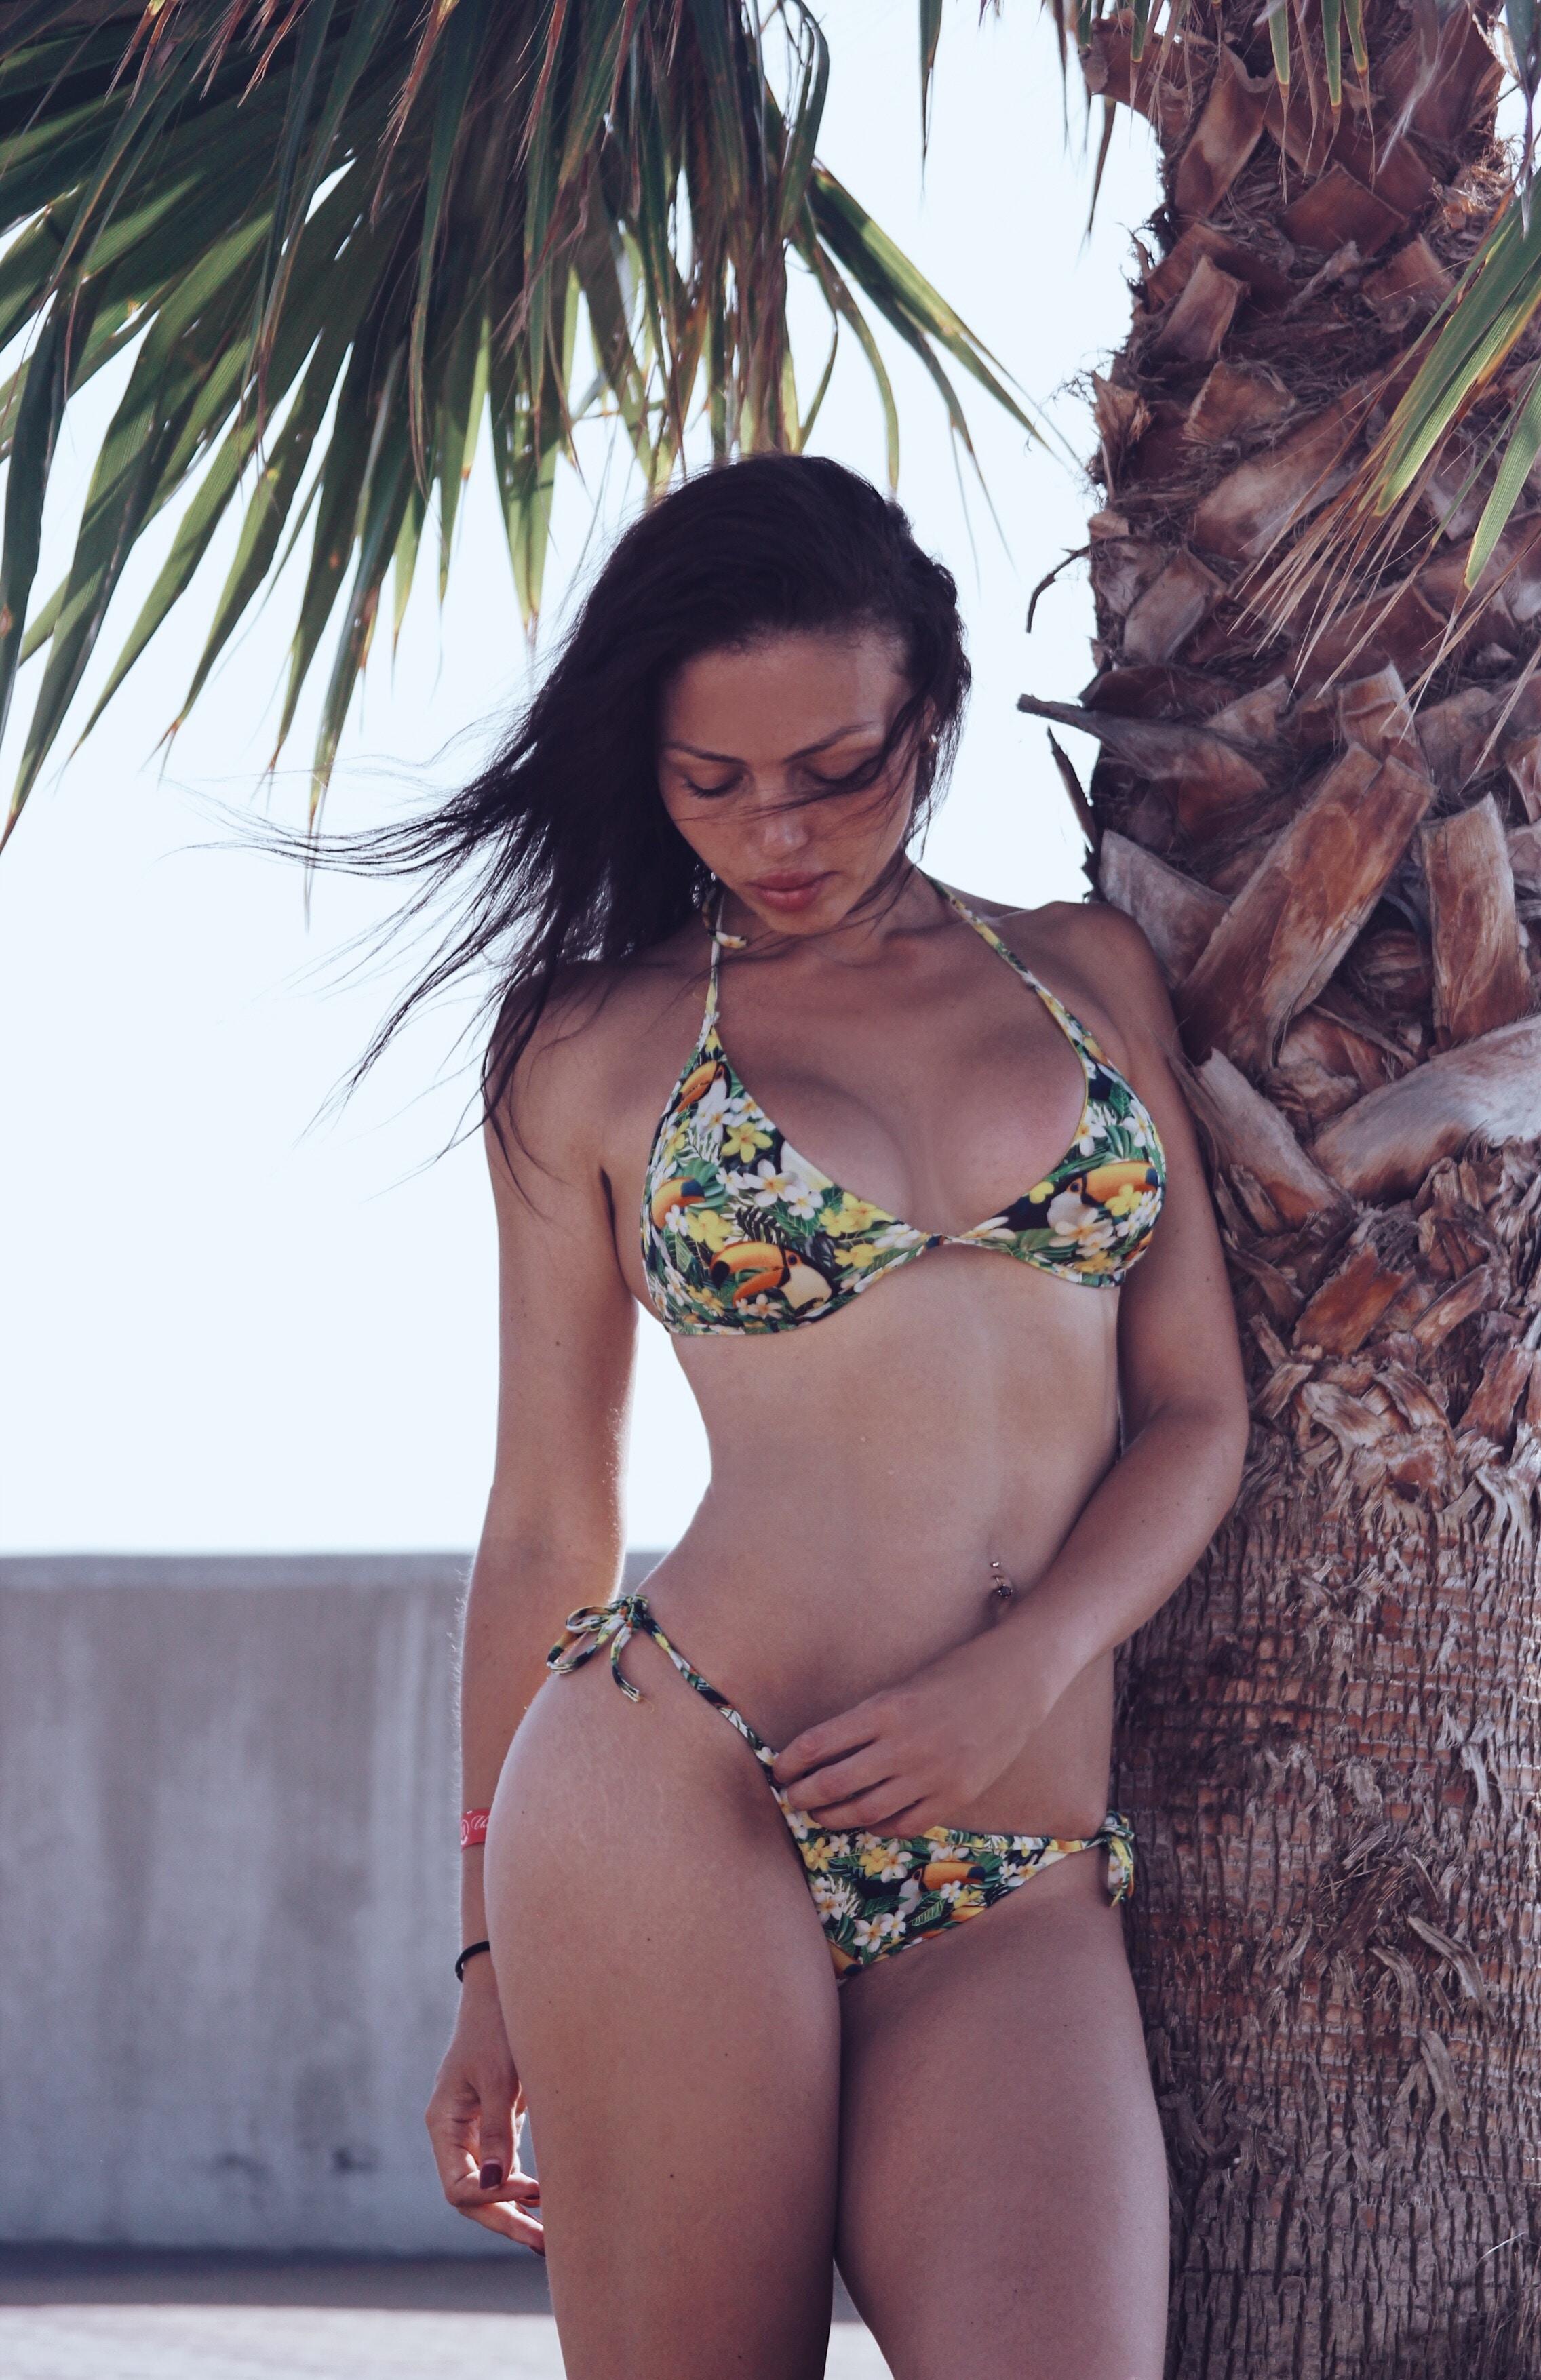 Woman Wearing Floral Bikini Set Standing Beside Palm Tree At Daytime